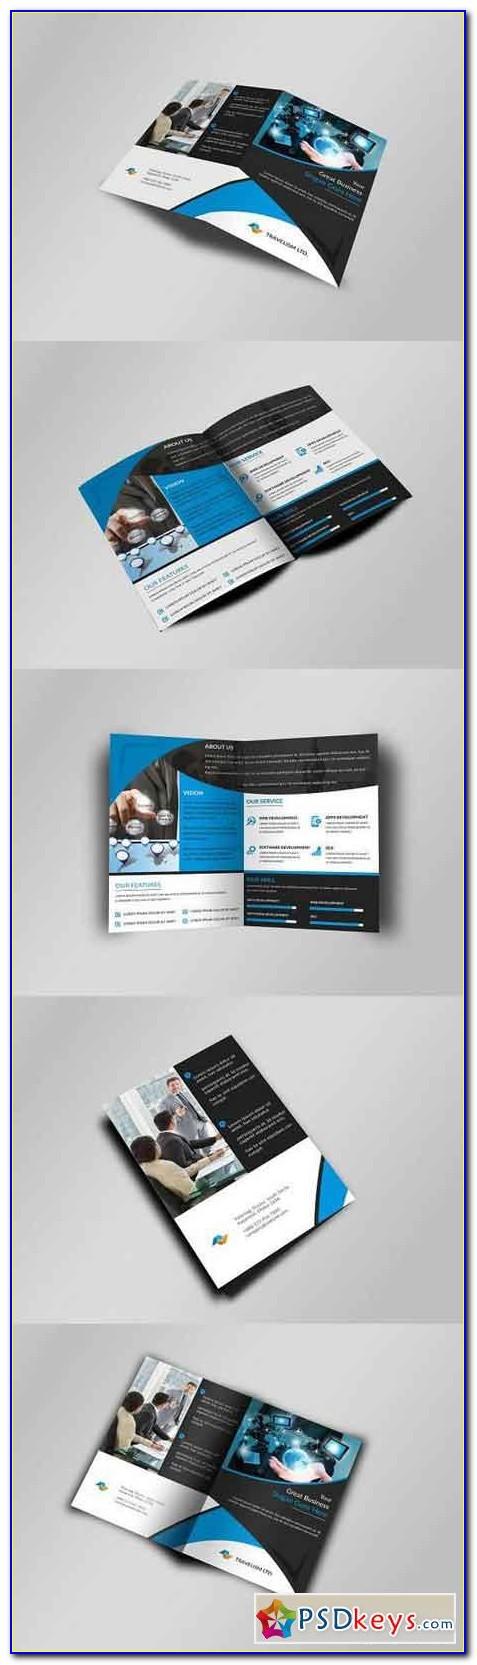 Free Bi Fold Brochure Template Illustrator